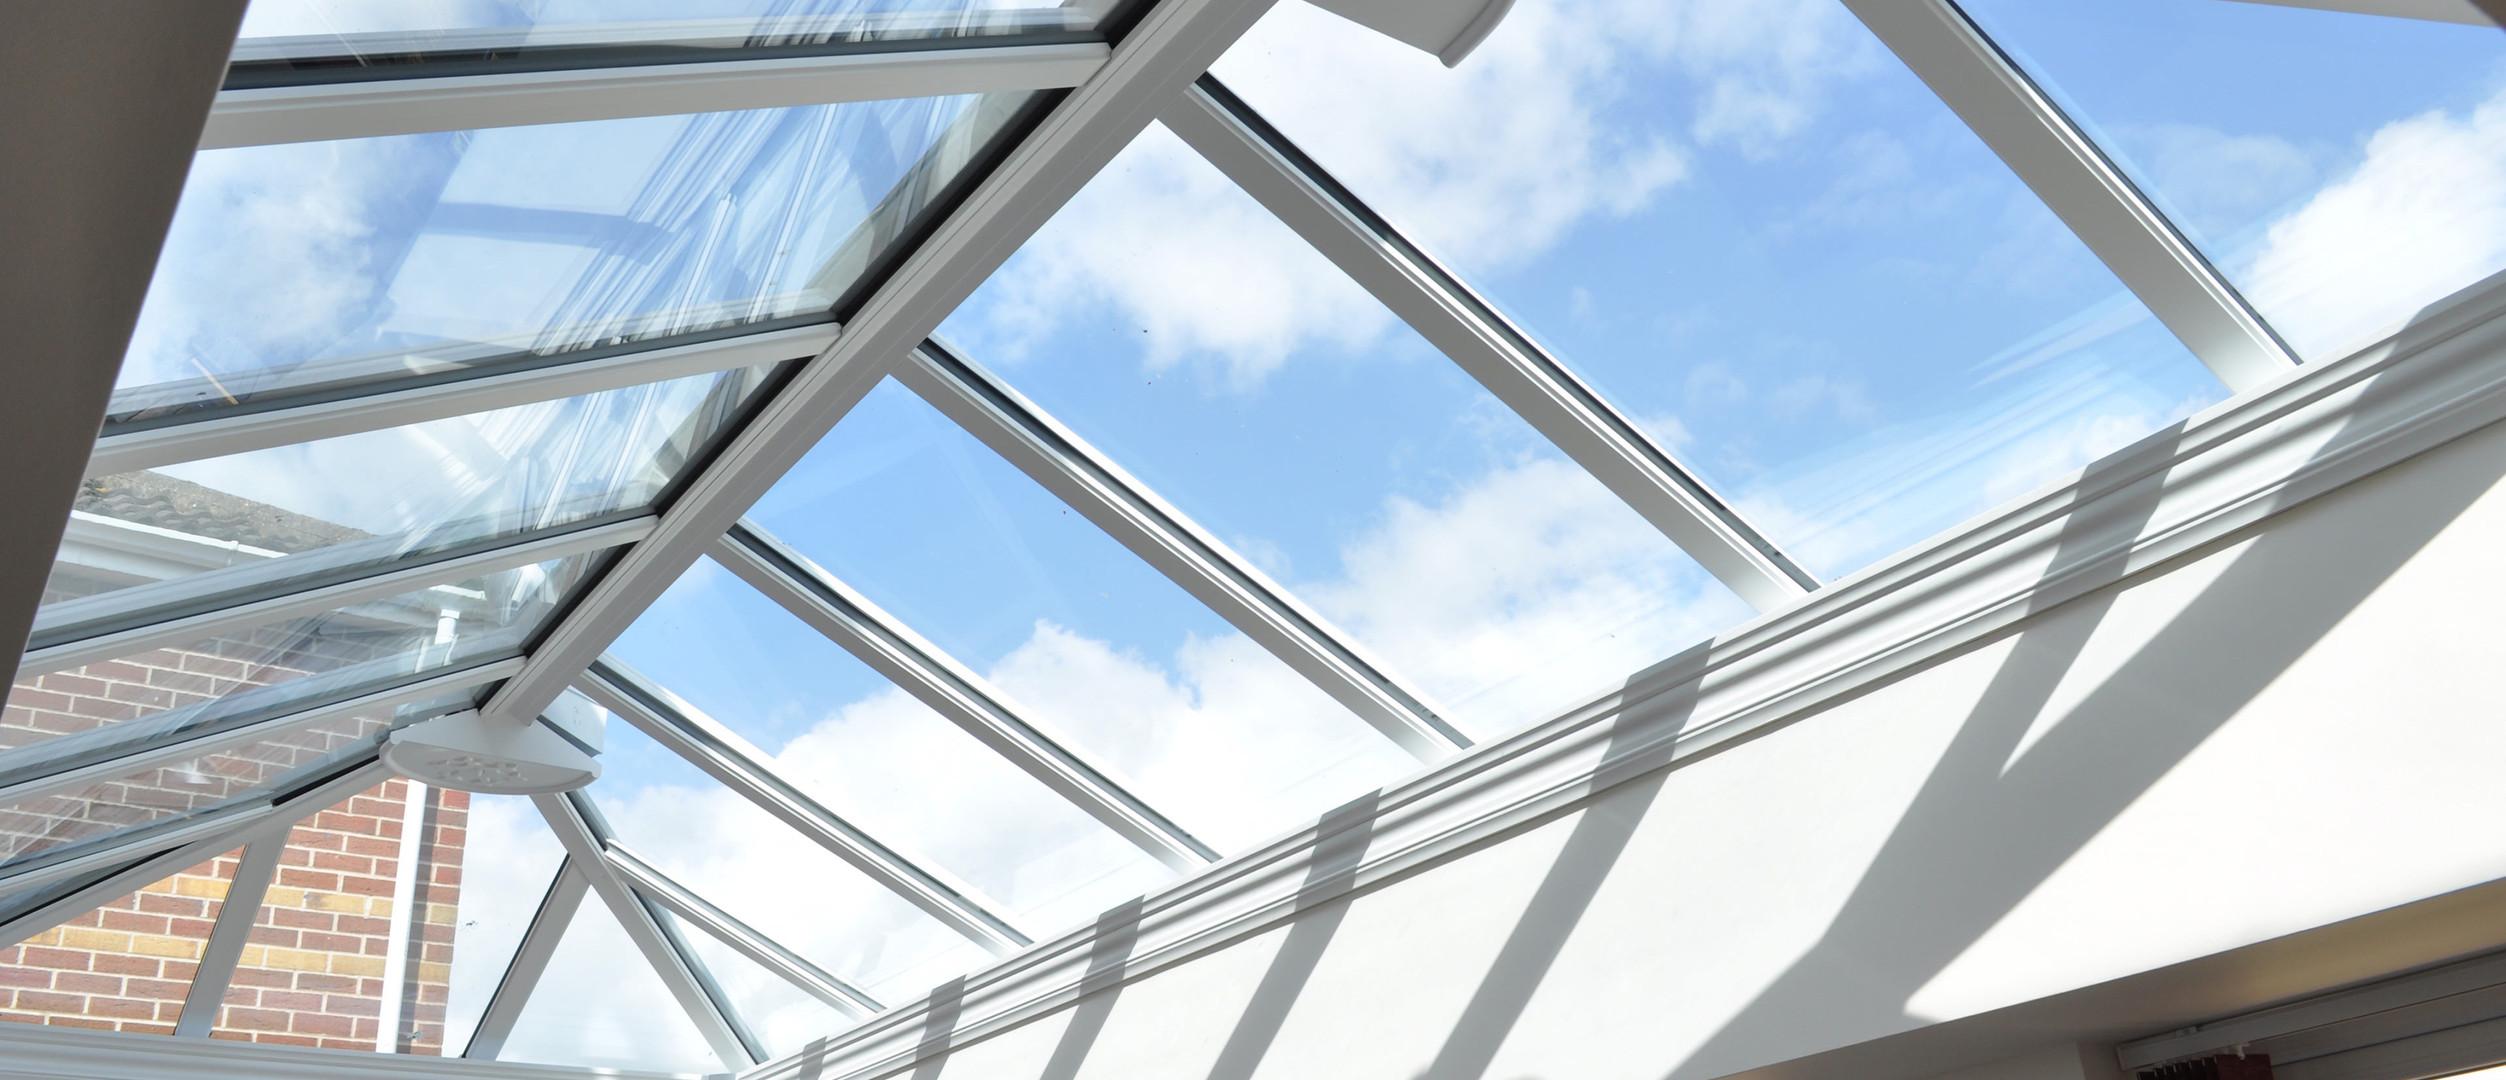 conservatory-roof.jpg